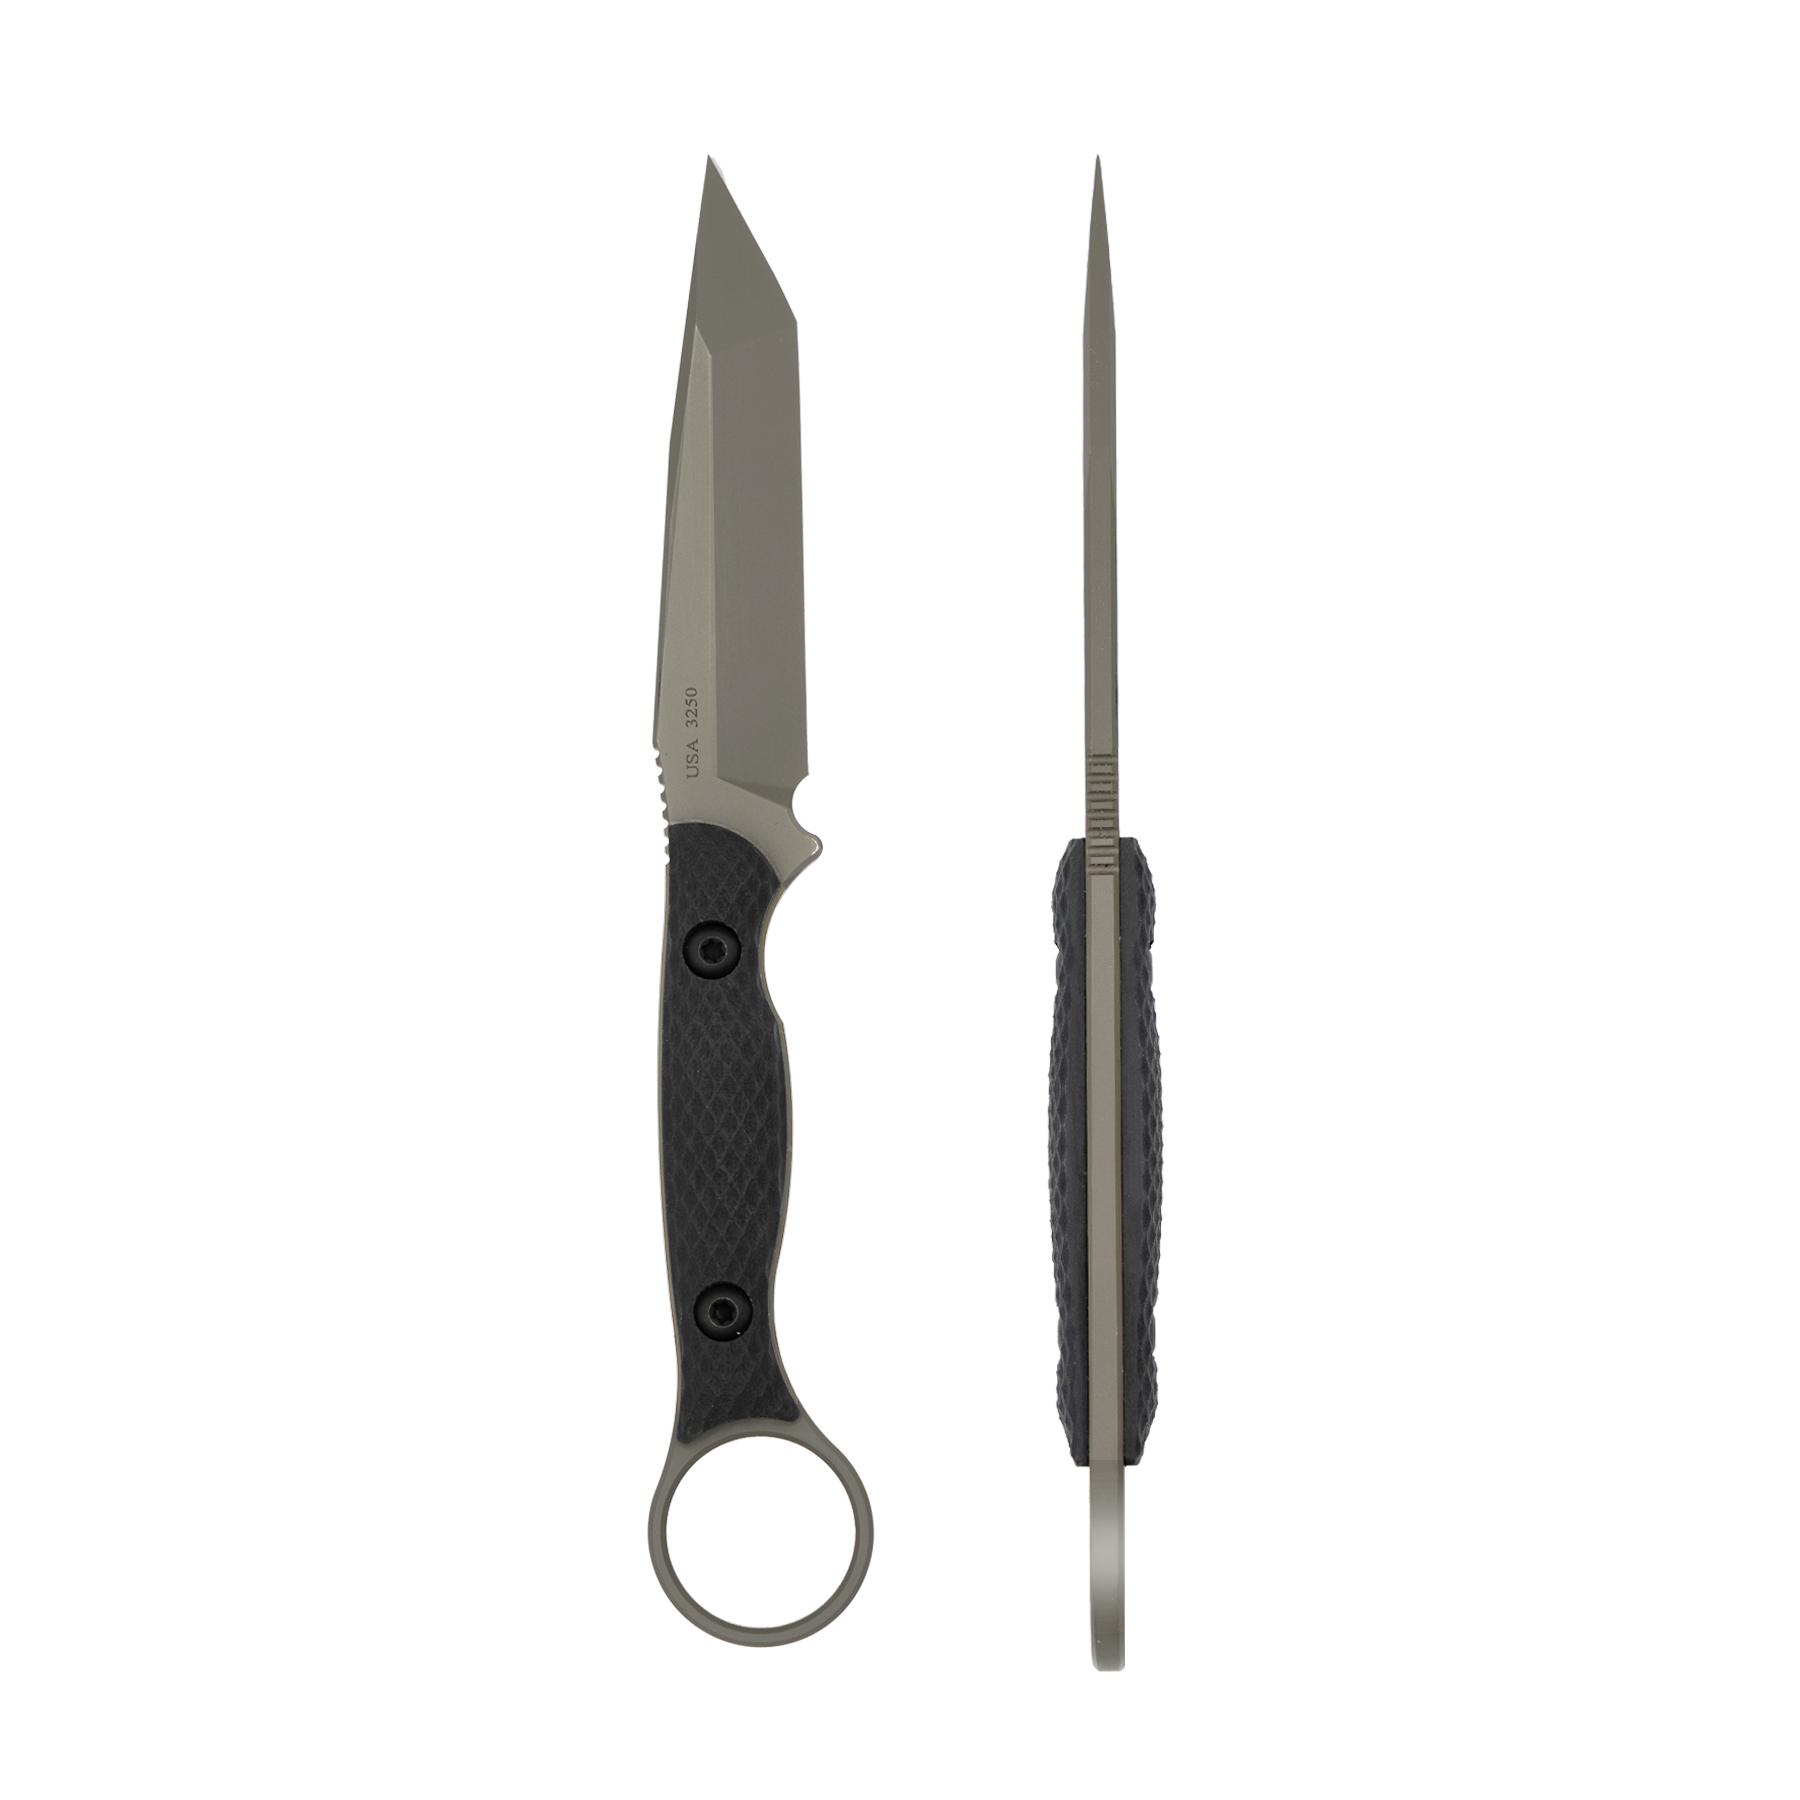 Toor Knives Serpent - Caiman Green